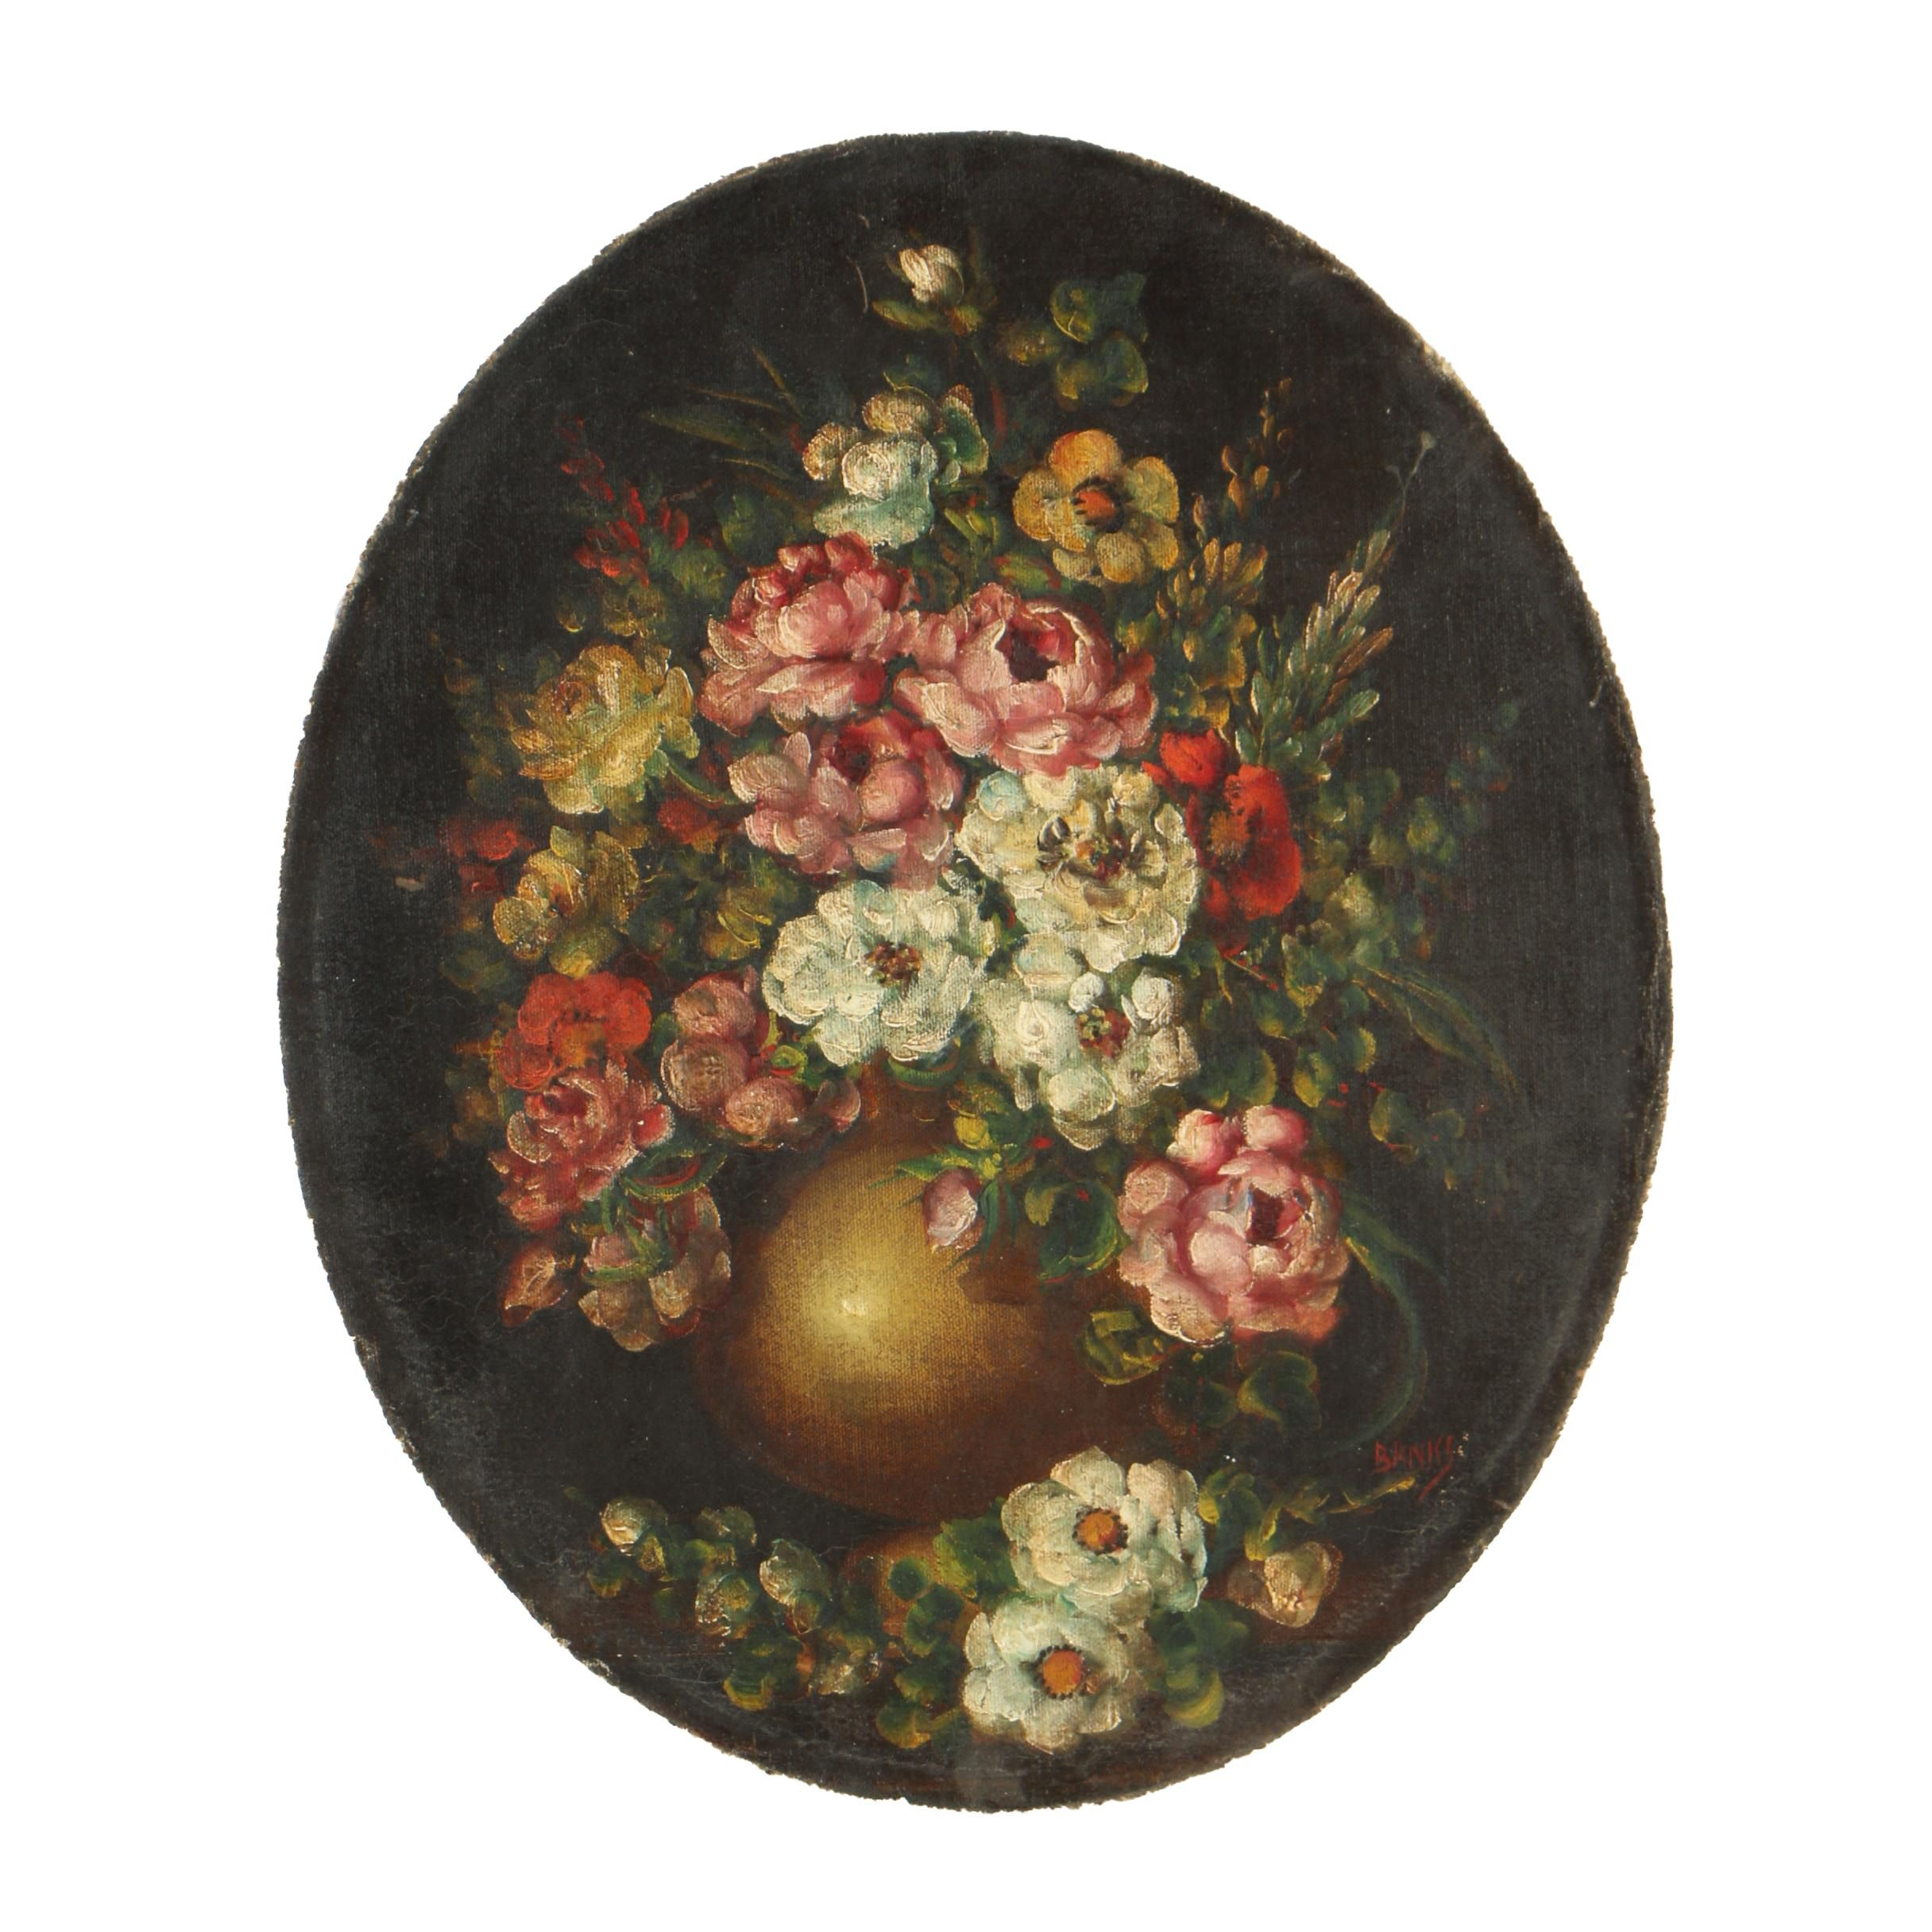 Vintage Oil Painting of Flowers